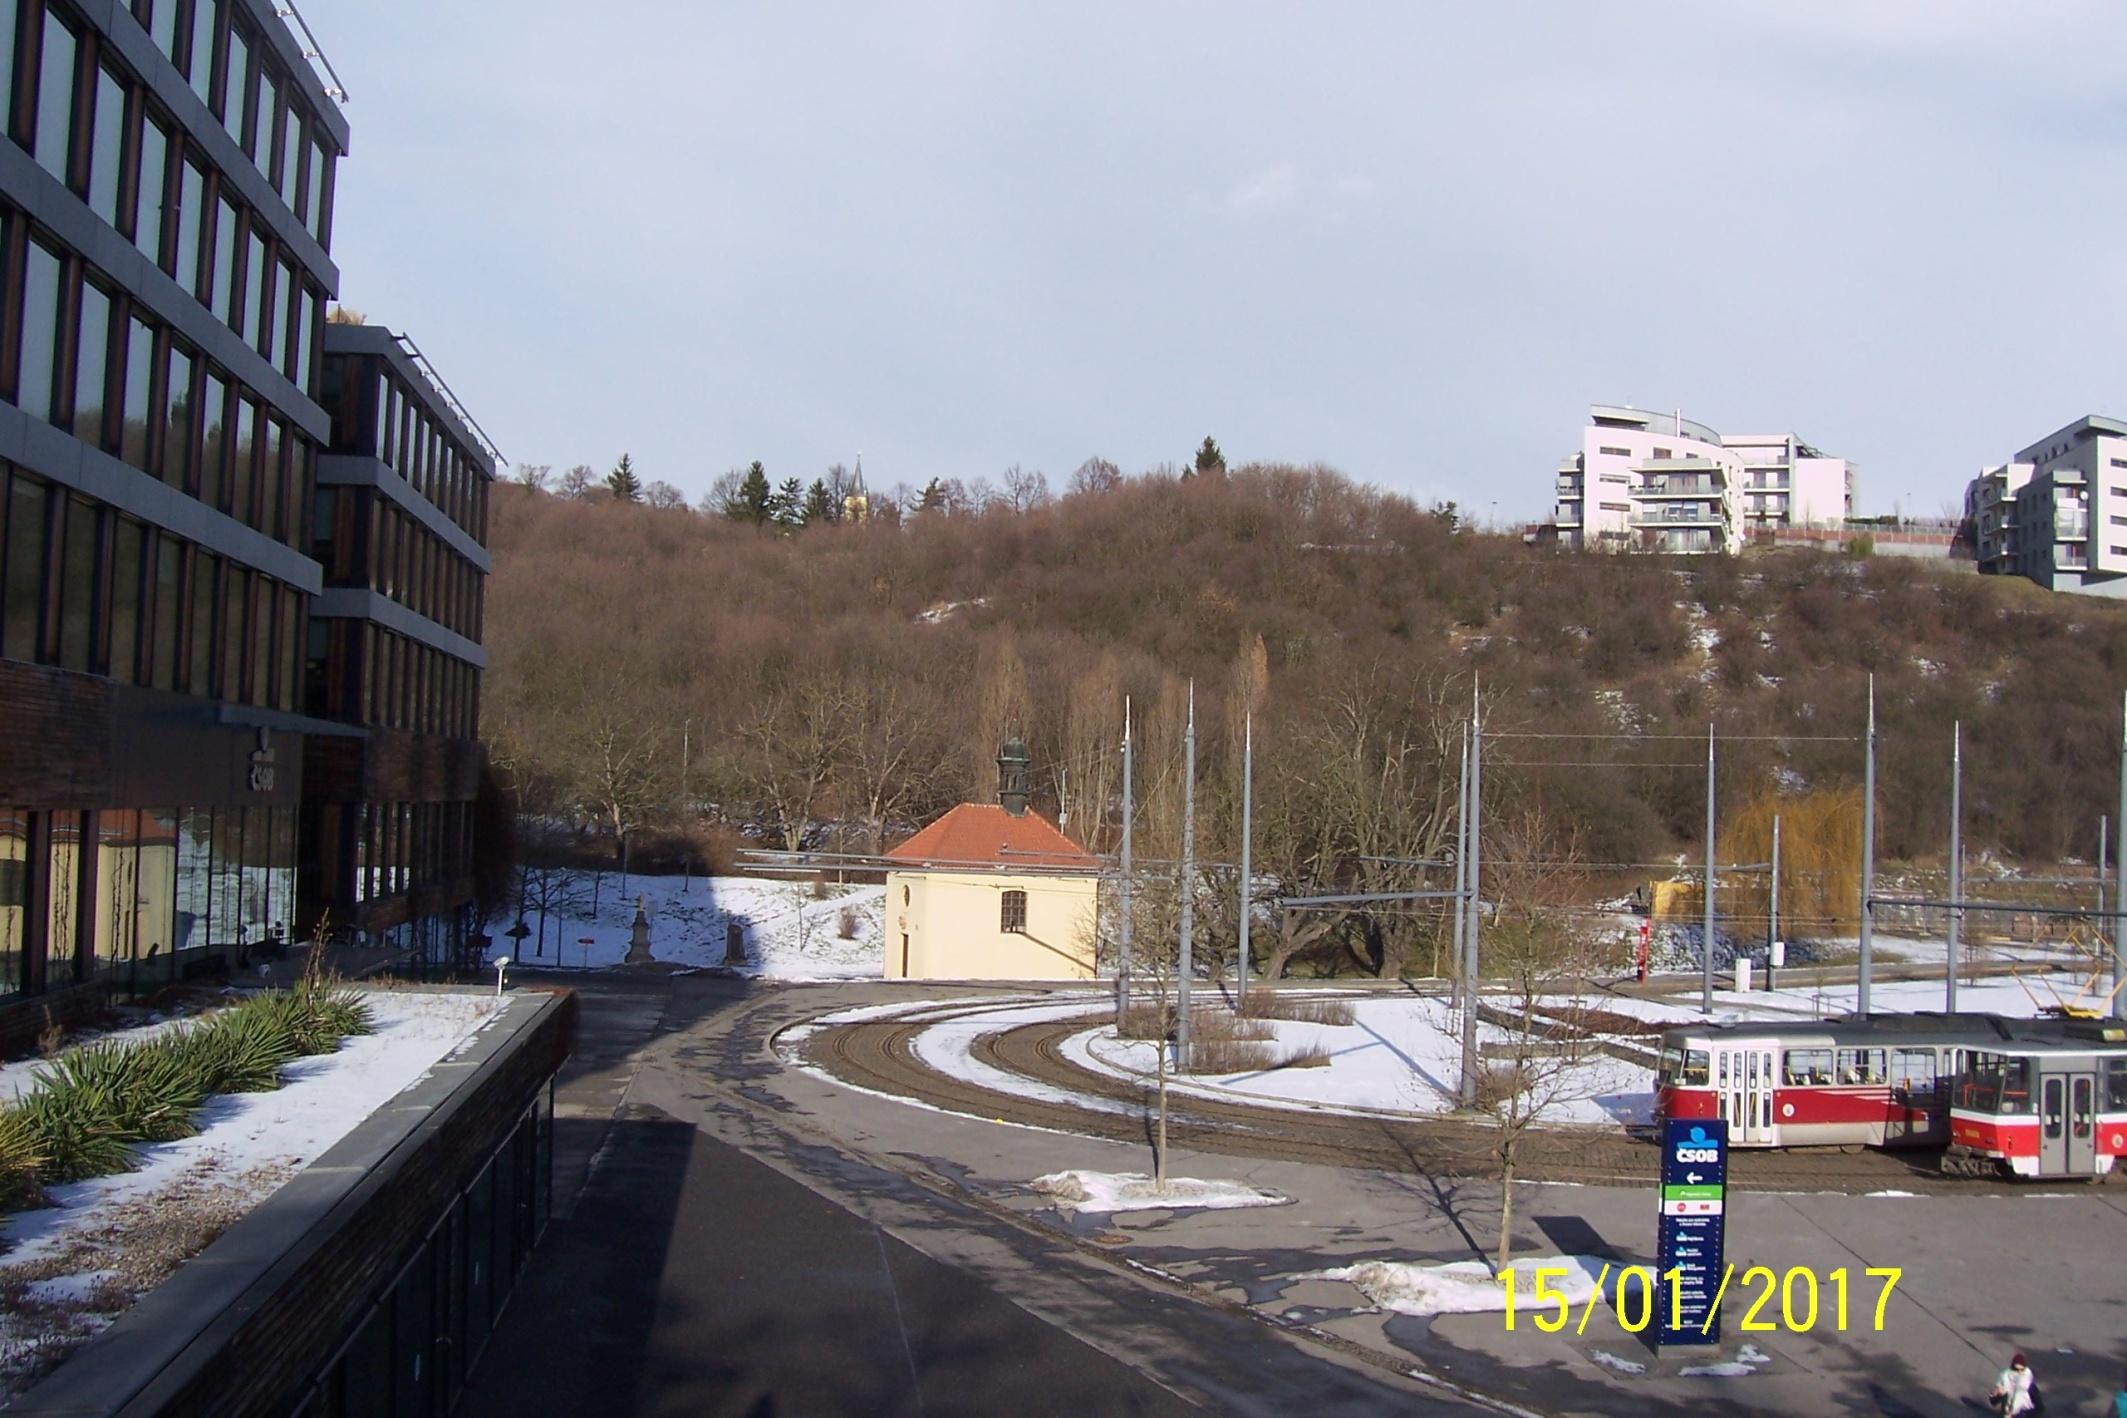 Zastavení 1 - tramvajová smyčka